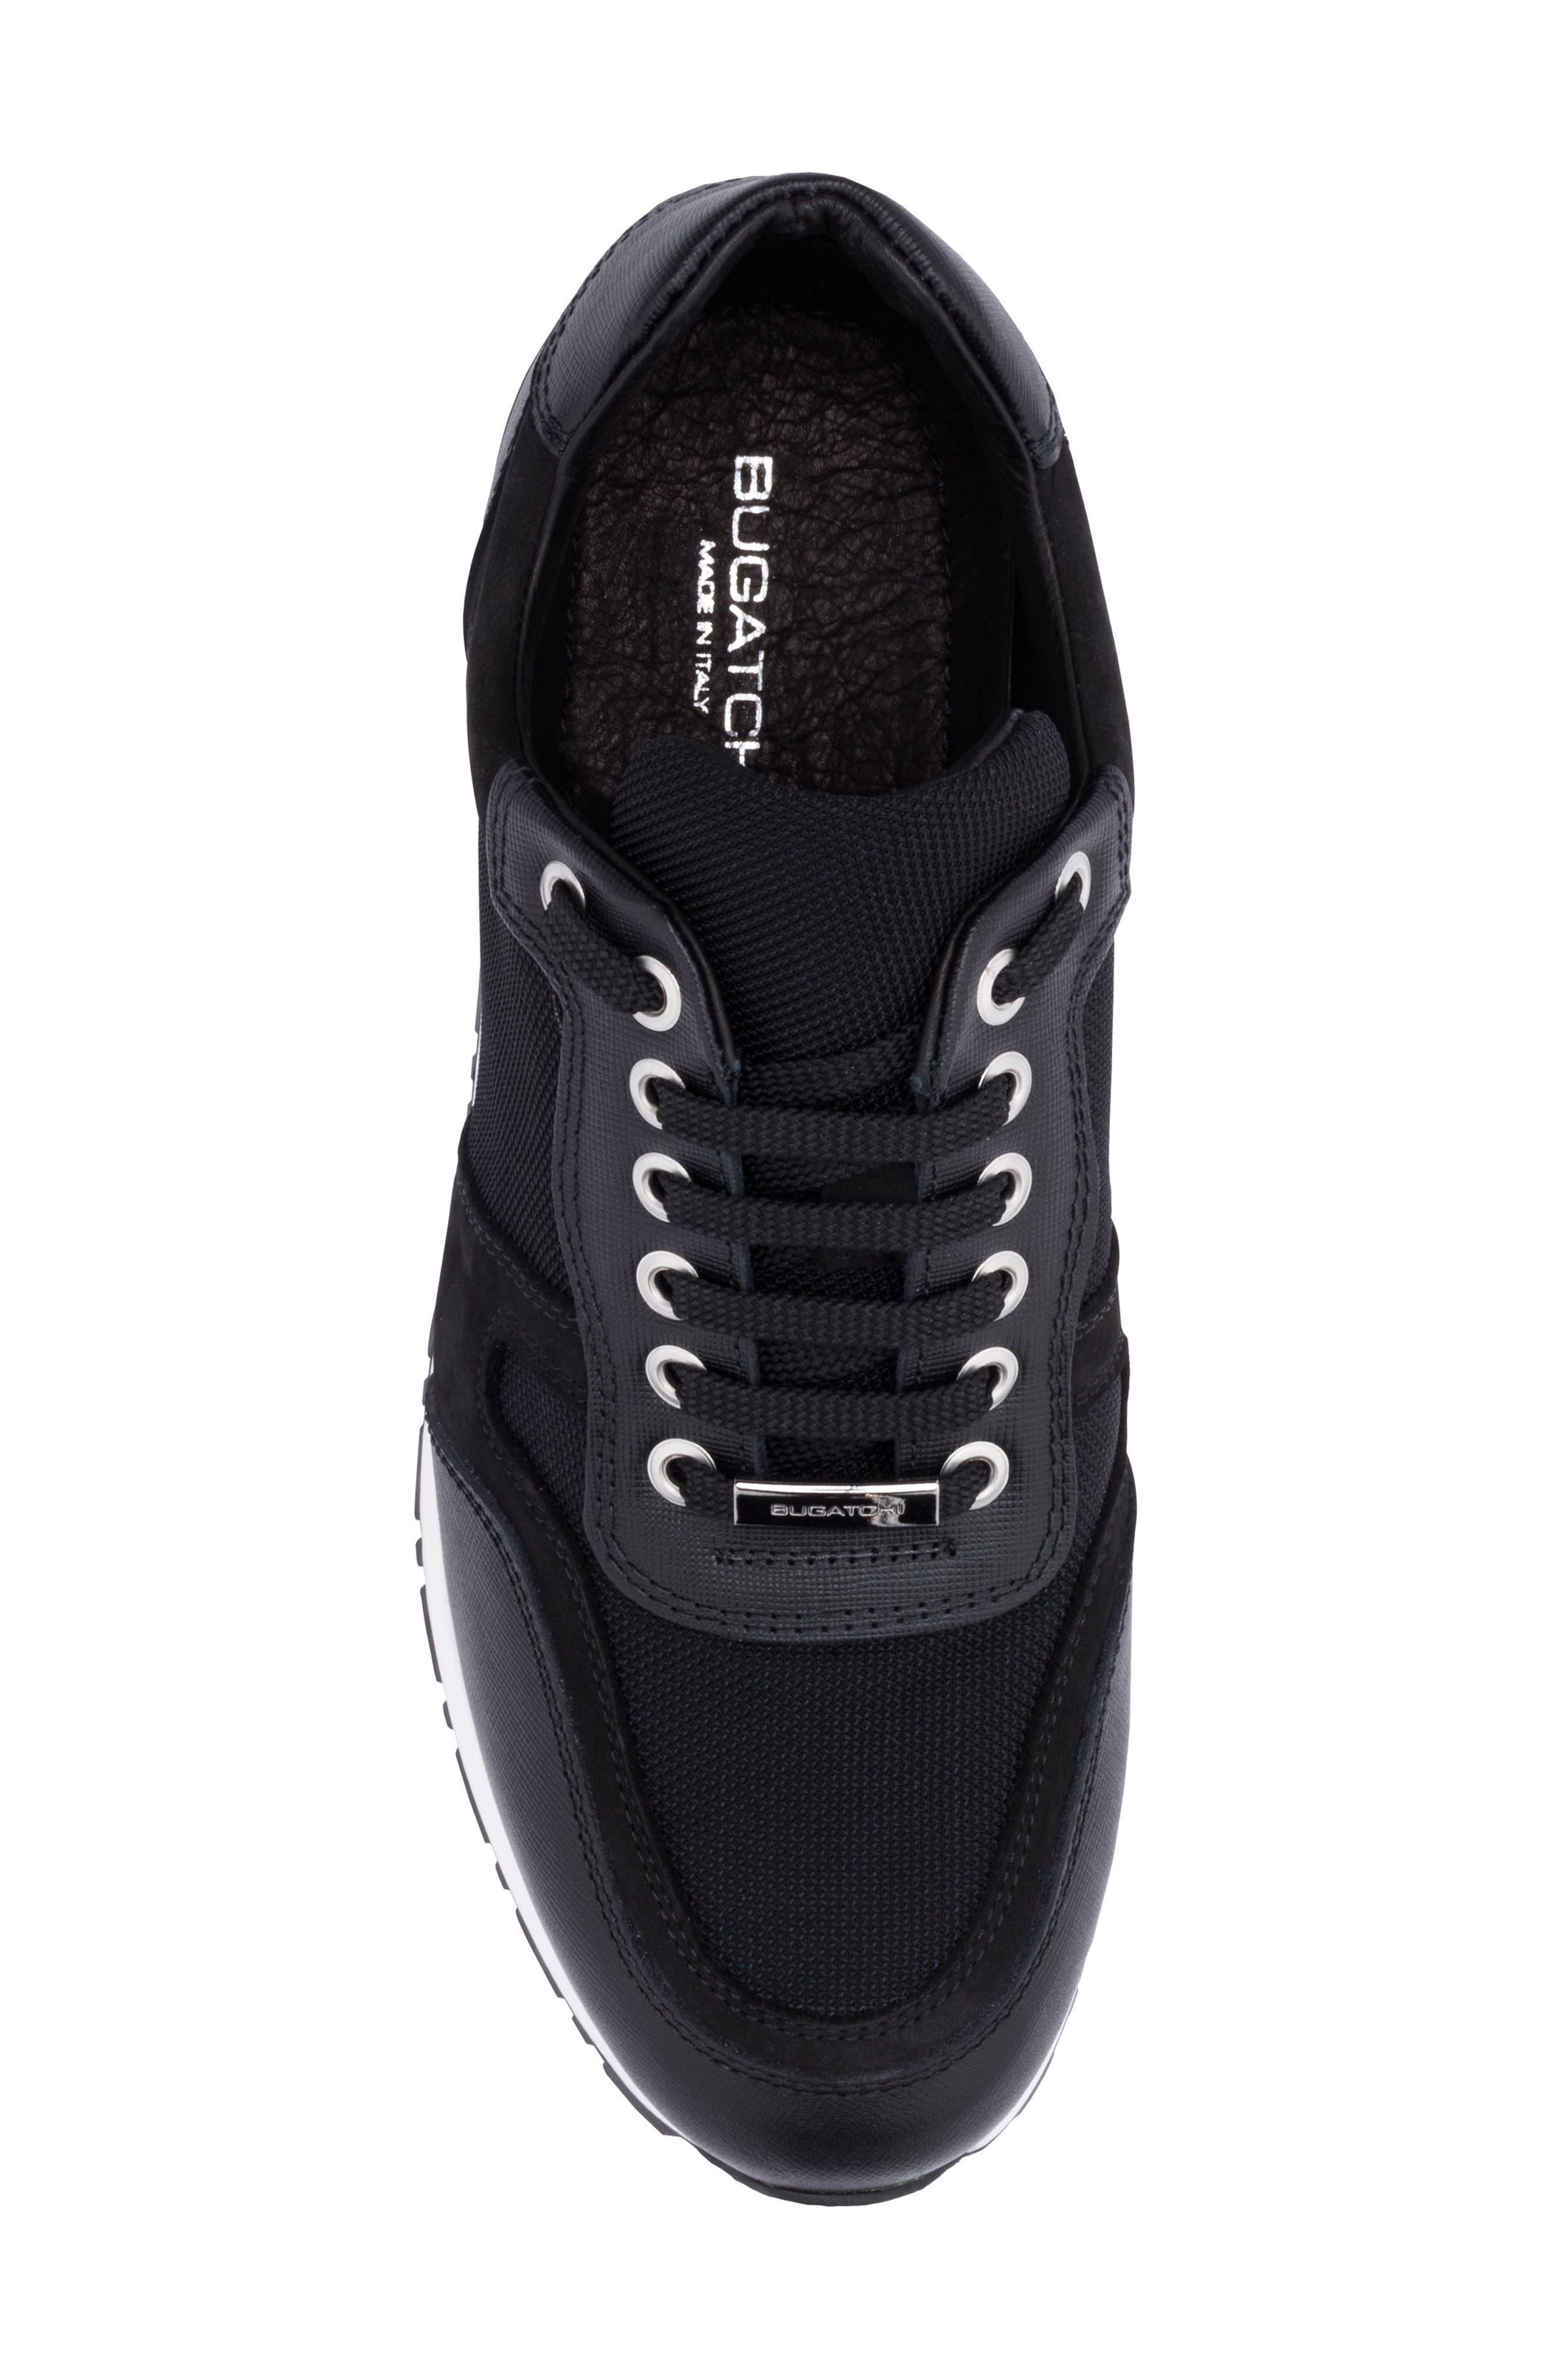 Modena Sneaker,                             Alternate thumbnail 5, color,                             Nero